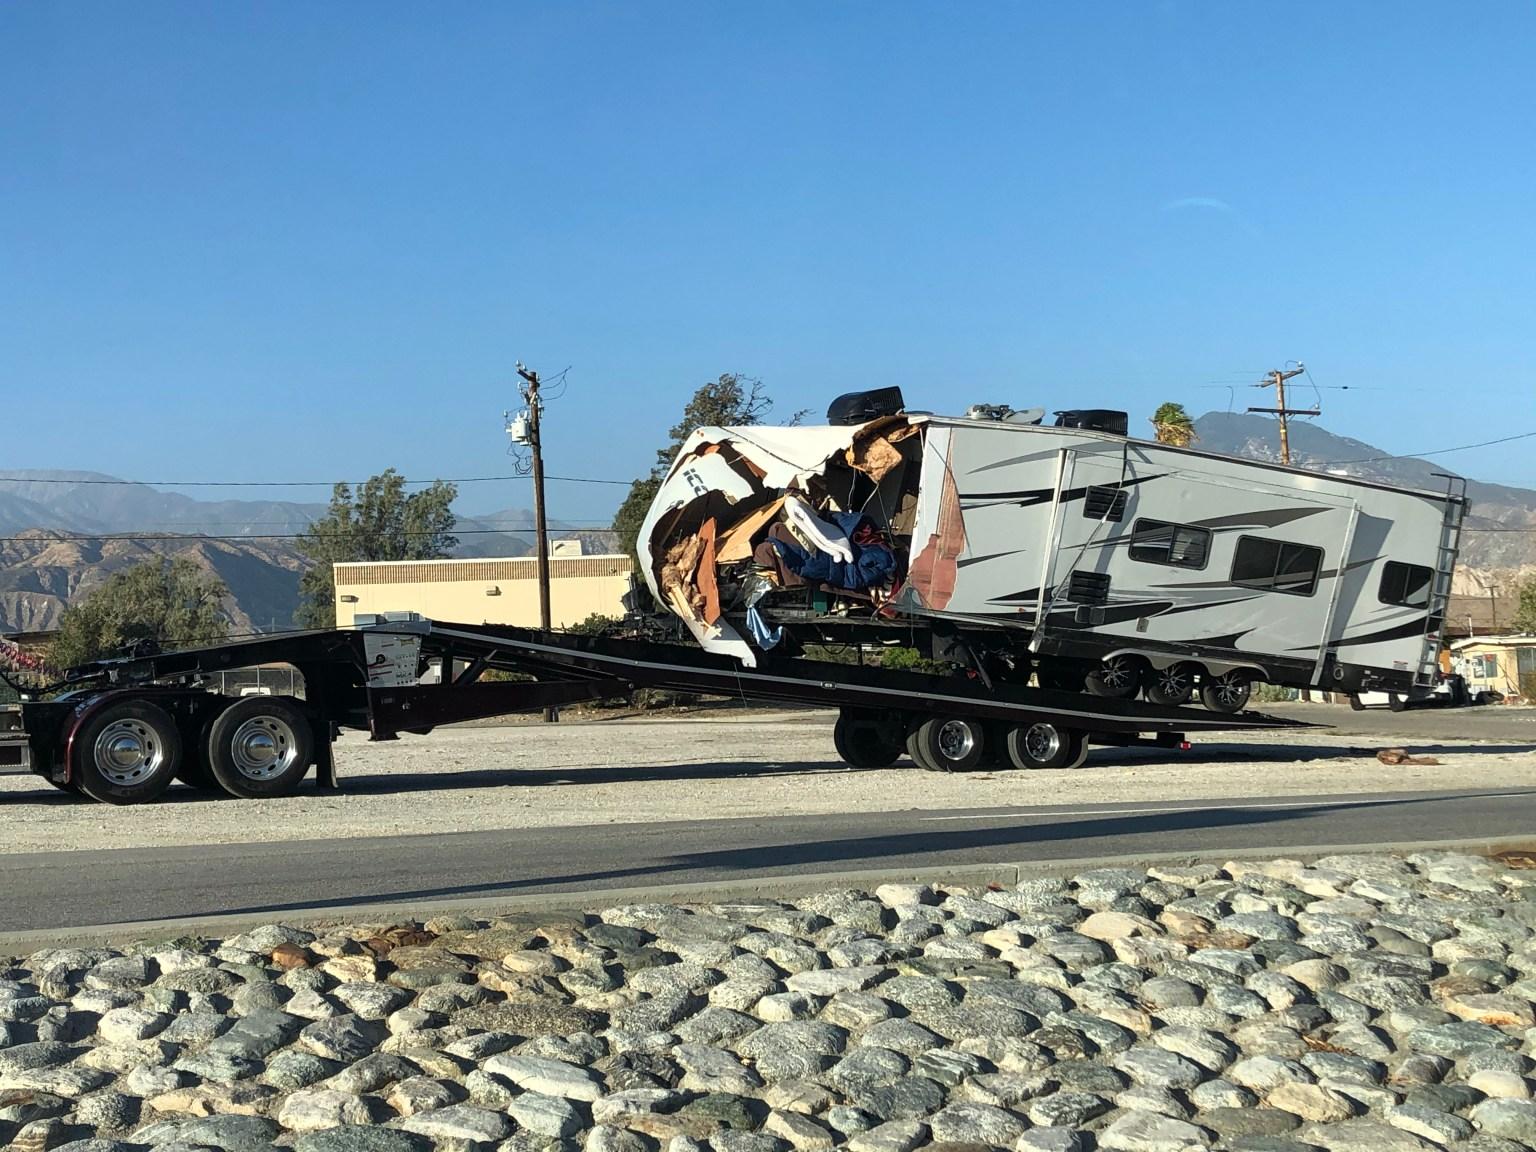 Pickup Truck, RV Collide on Interstate 10, Snarling Traffic